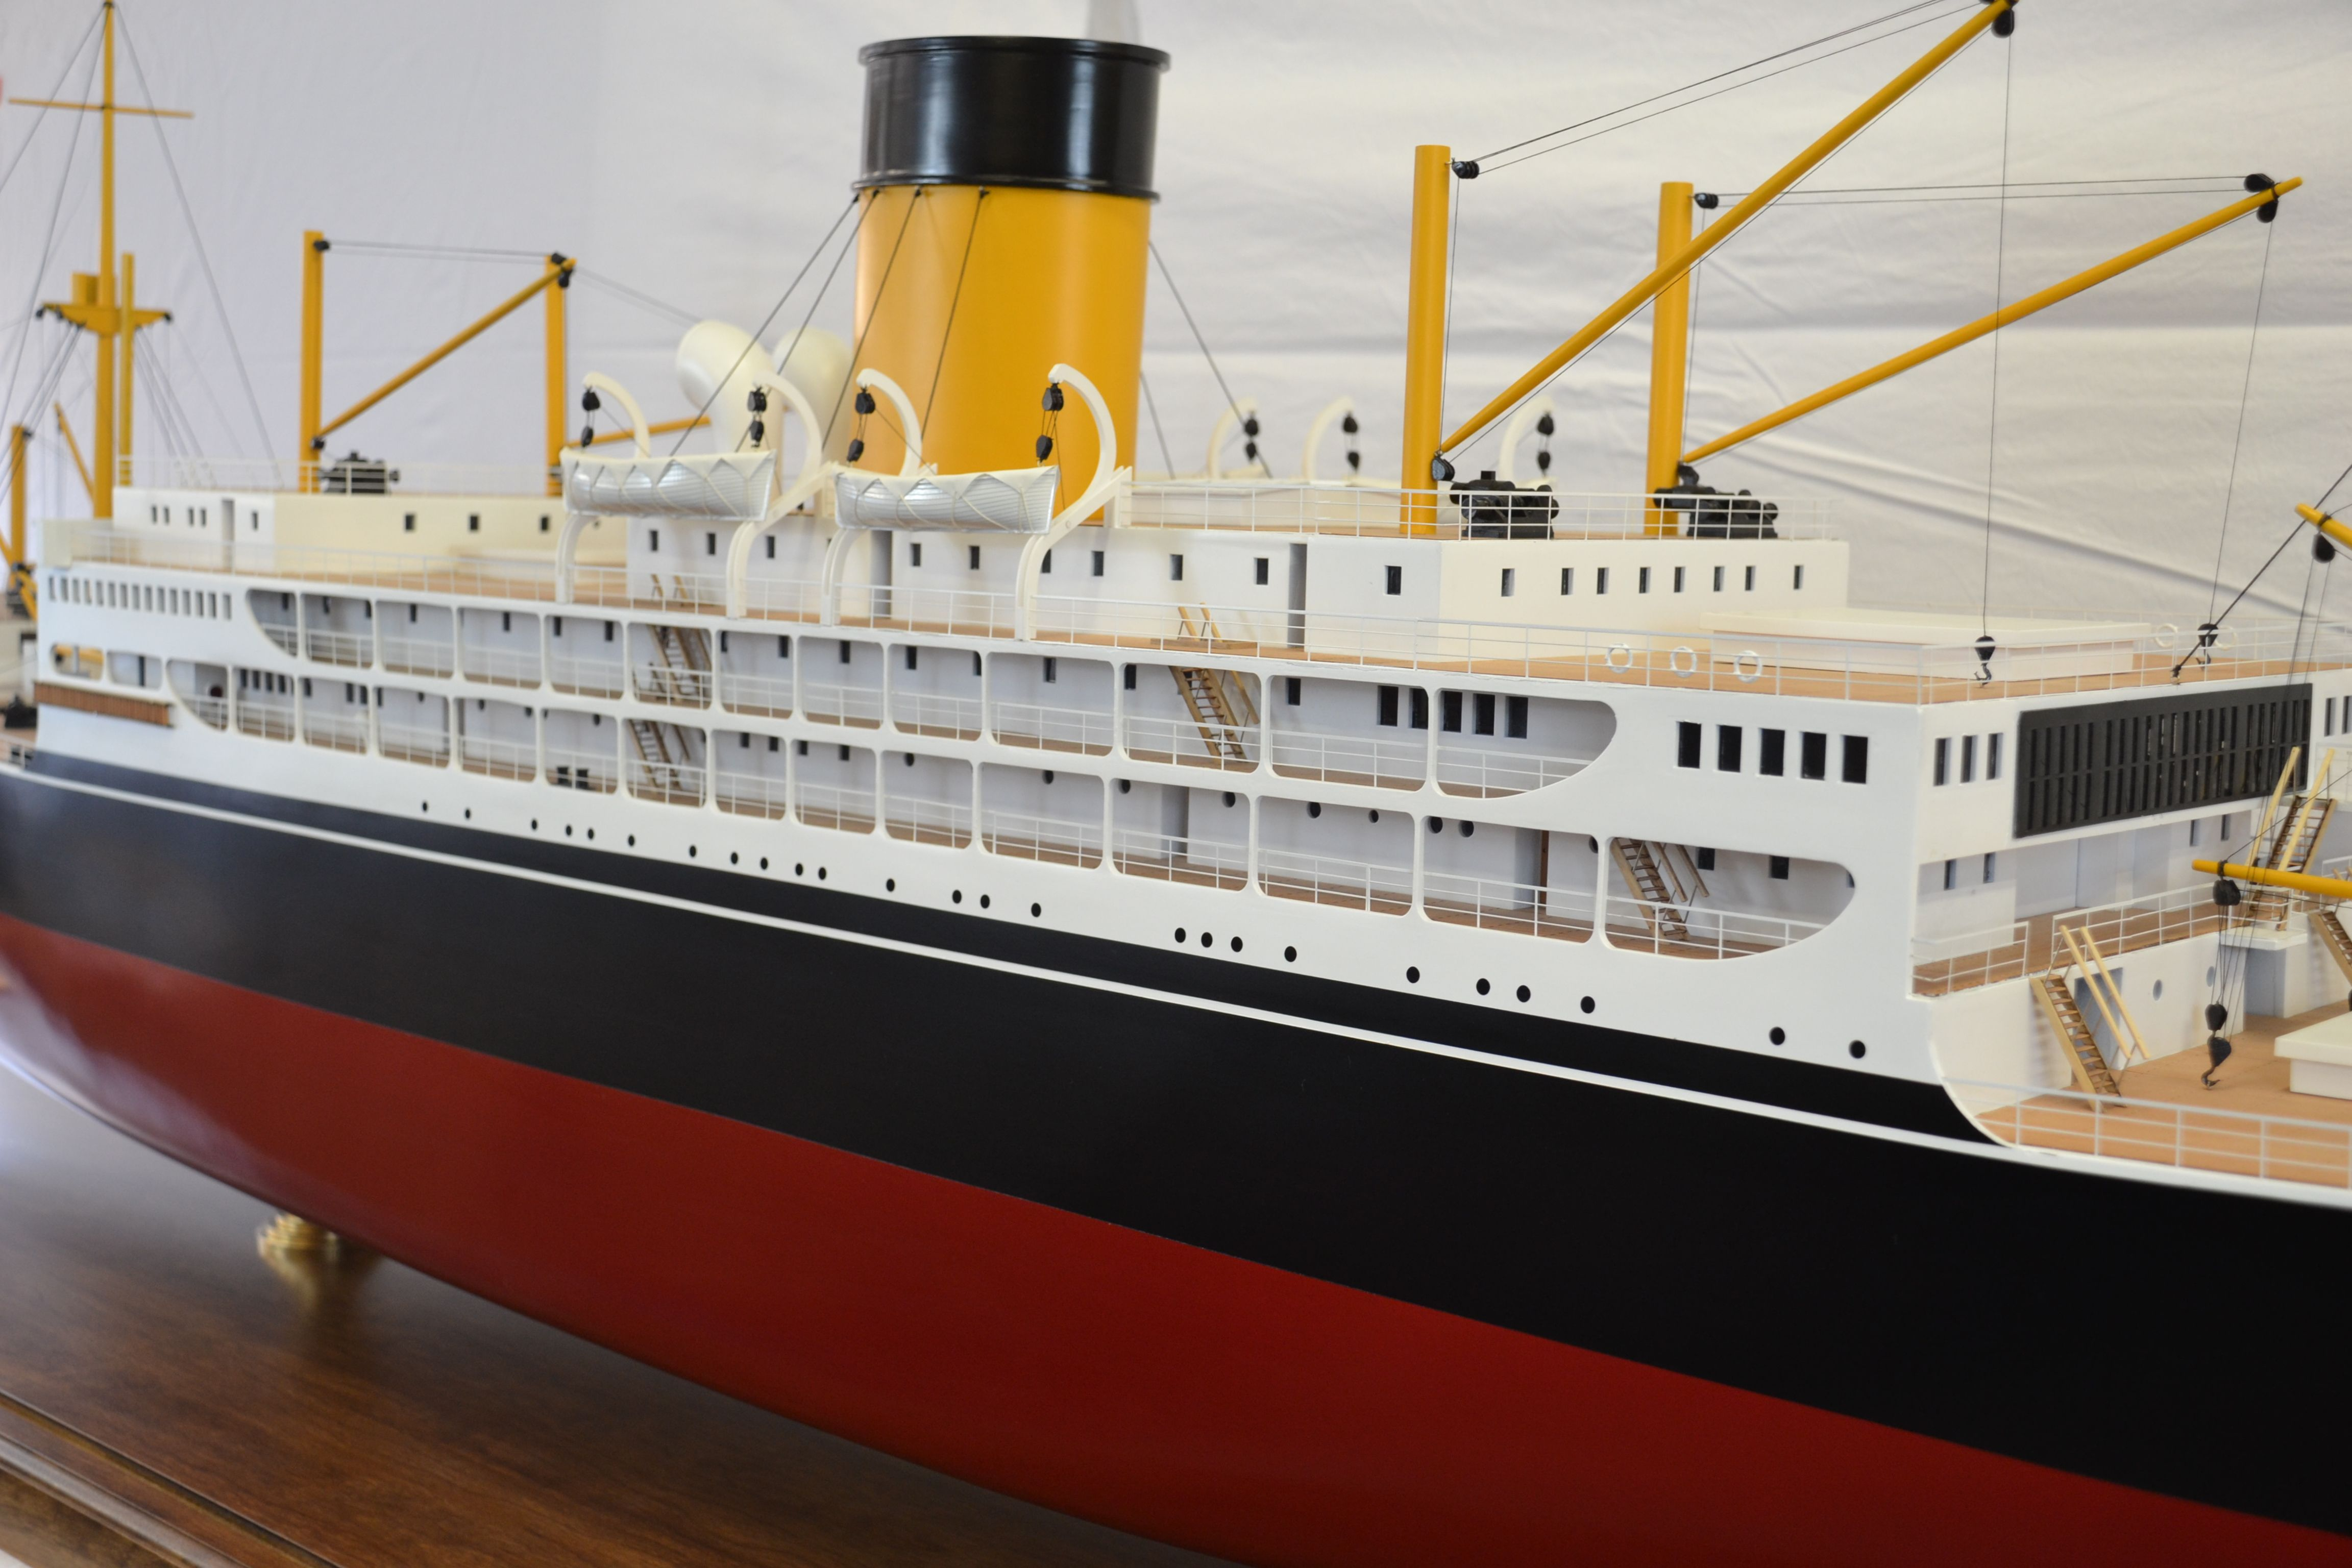 2209-12967-SS-Corinthic-Model-Ship